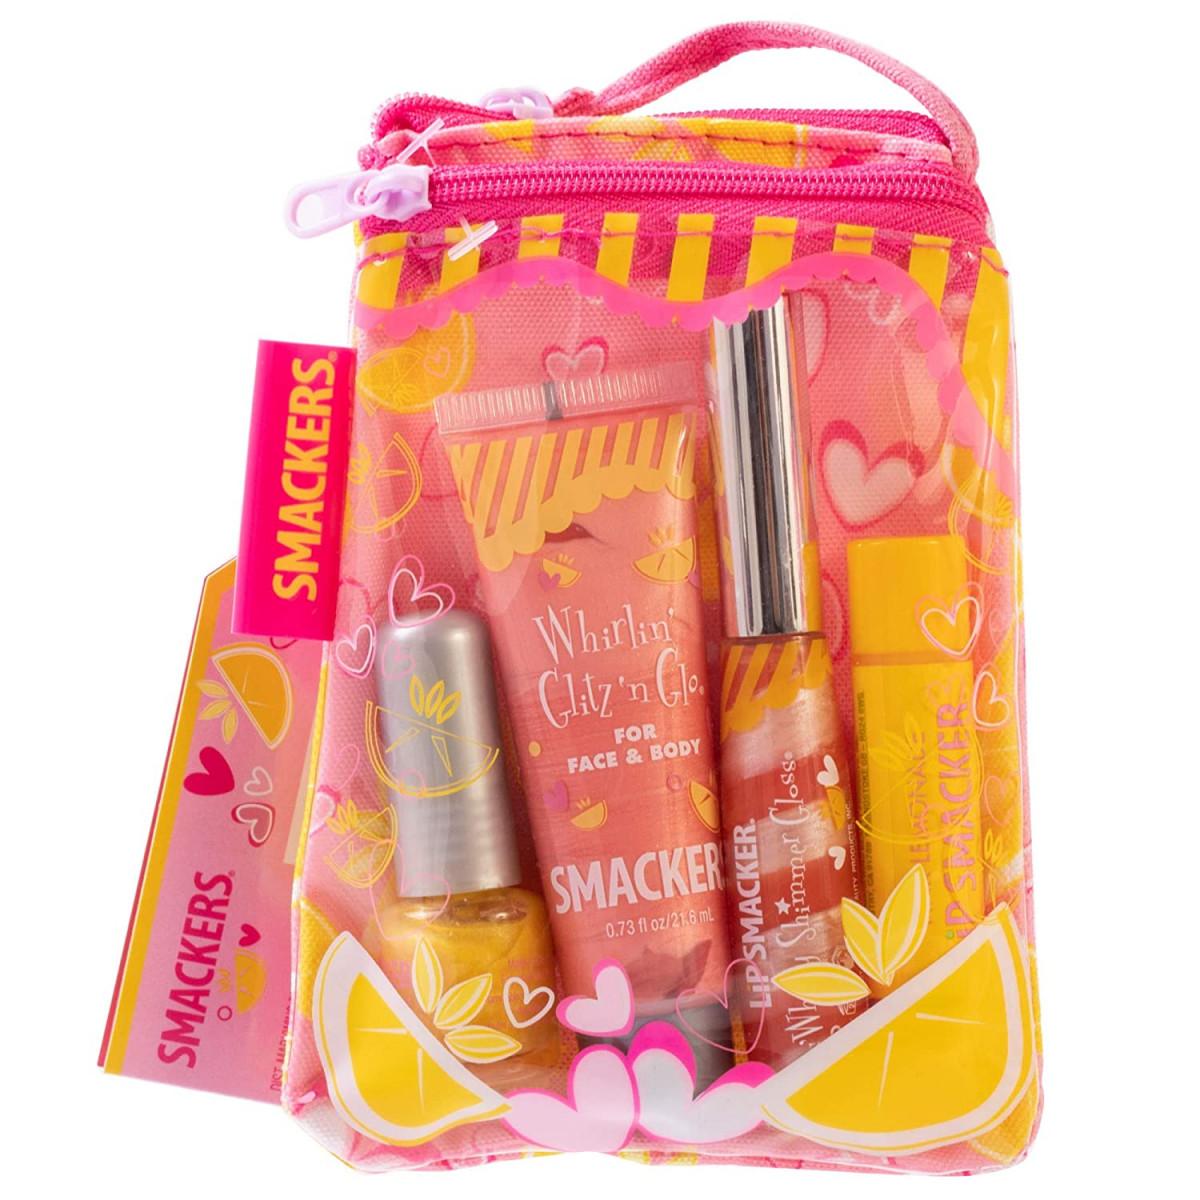 Smackers Pink Lemonade Glam Bag Makeup Set  – 20% PRICE DROP+SUB/SAVE!